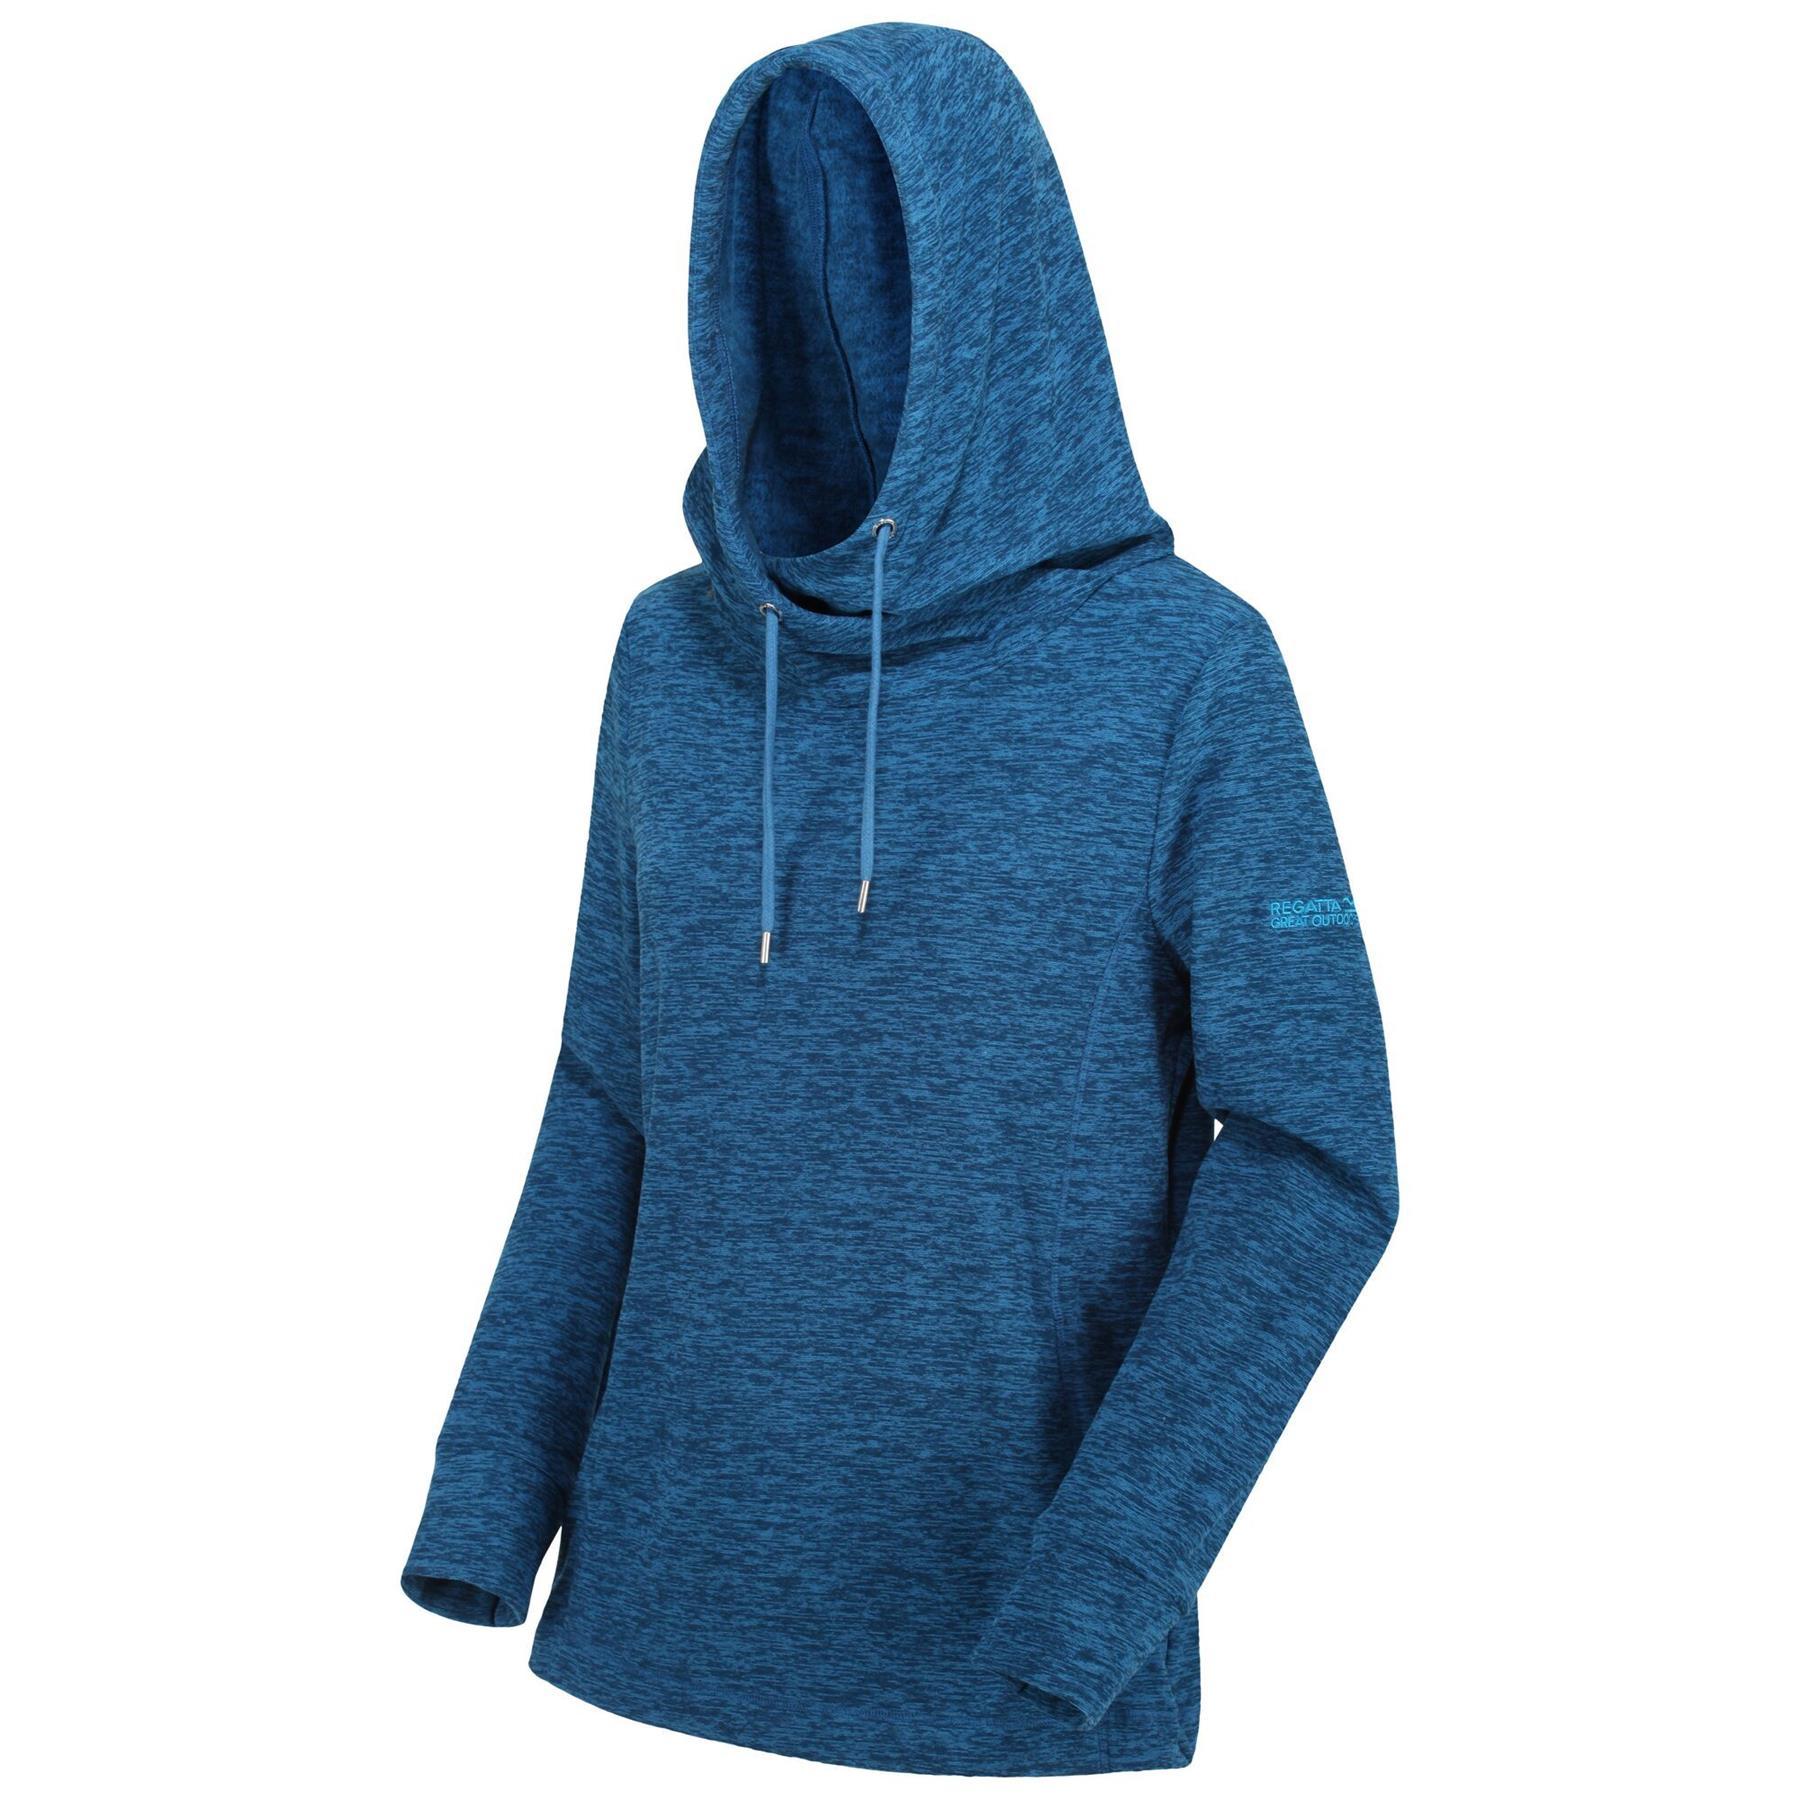 Regatta Damen Kizmit Ii Lightweight Cowl Neck Hooded Fleece Fleece